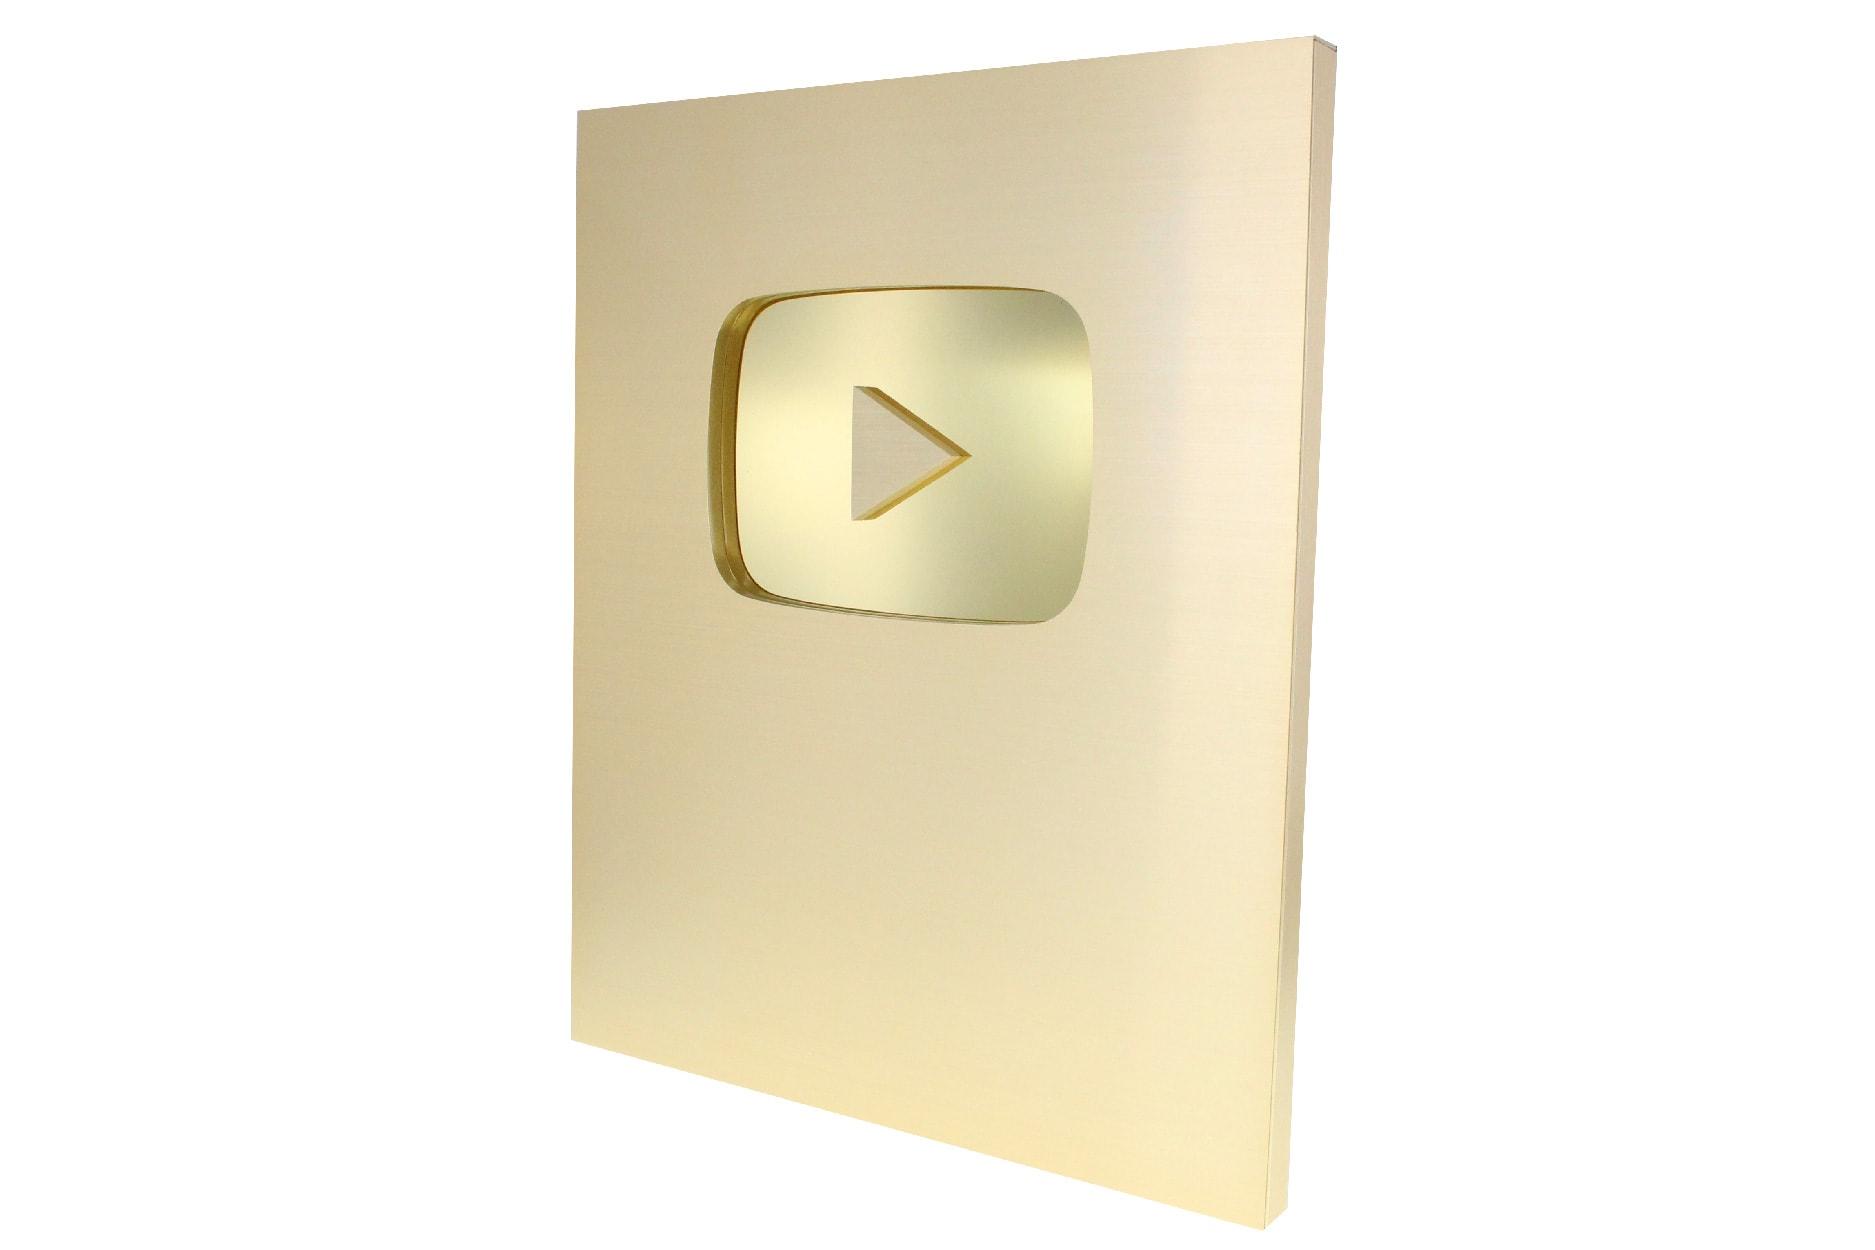 play-btn-awards-gold-level